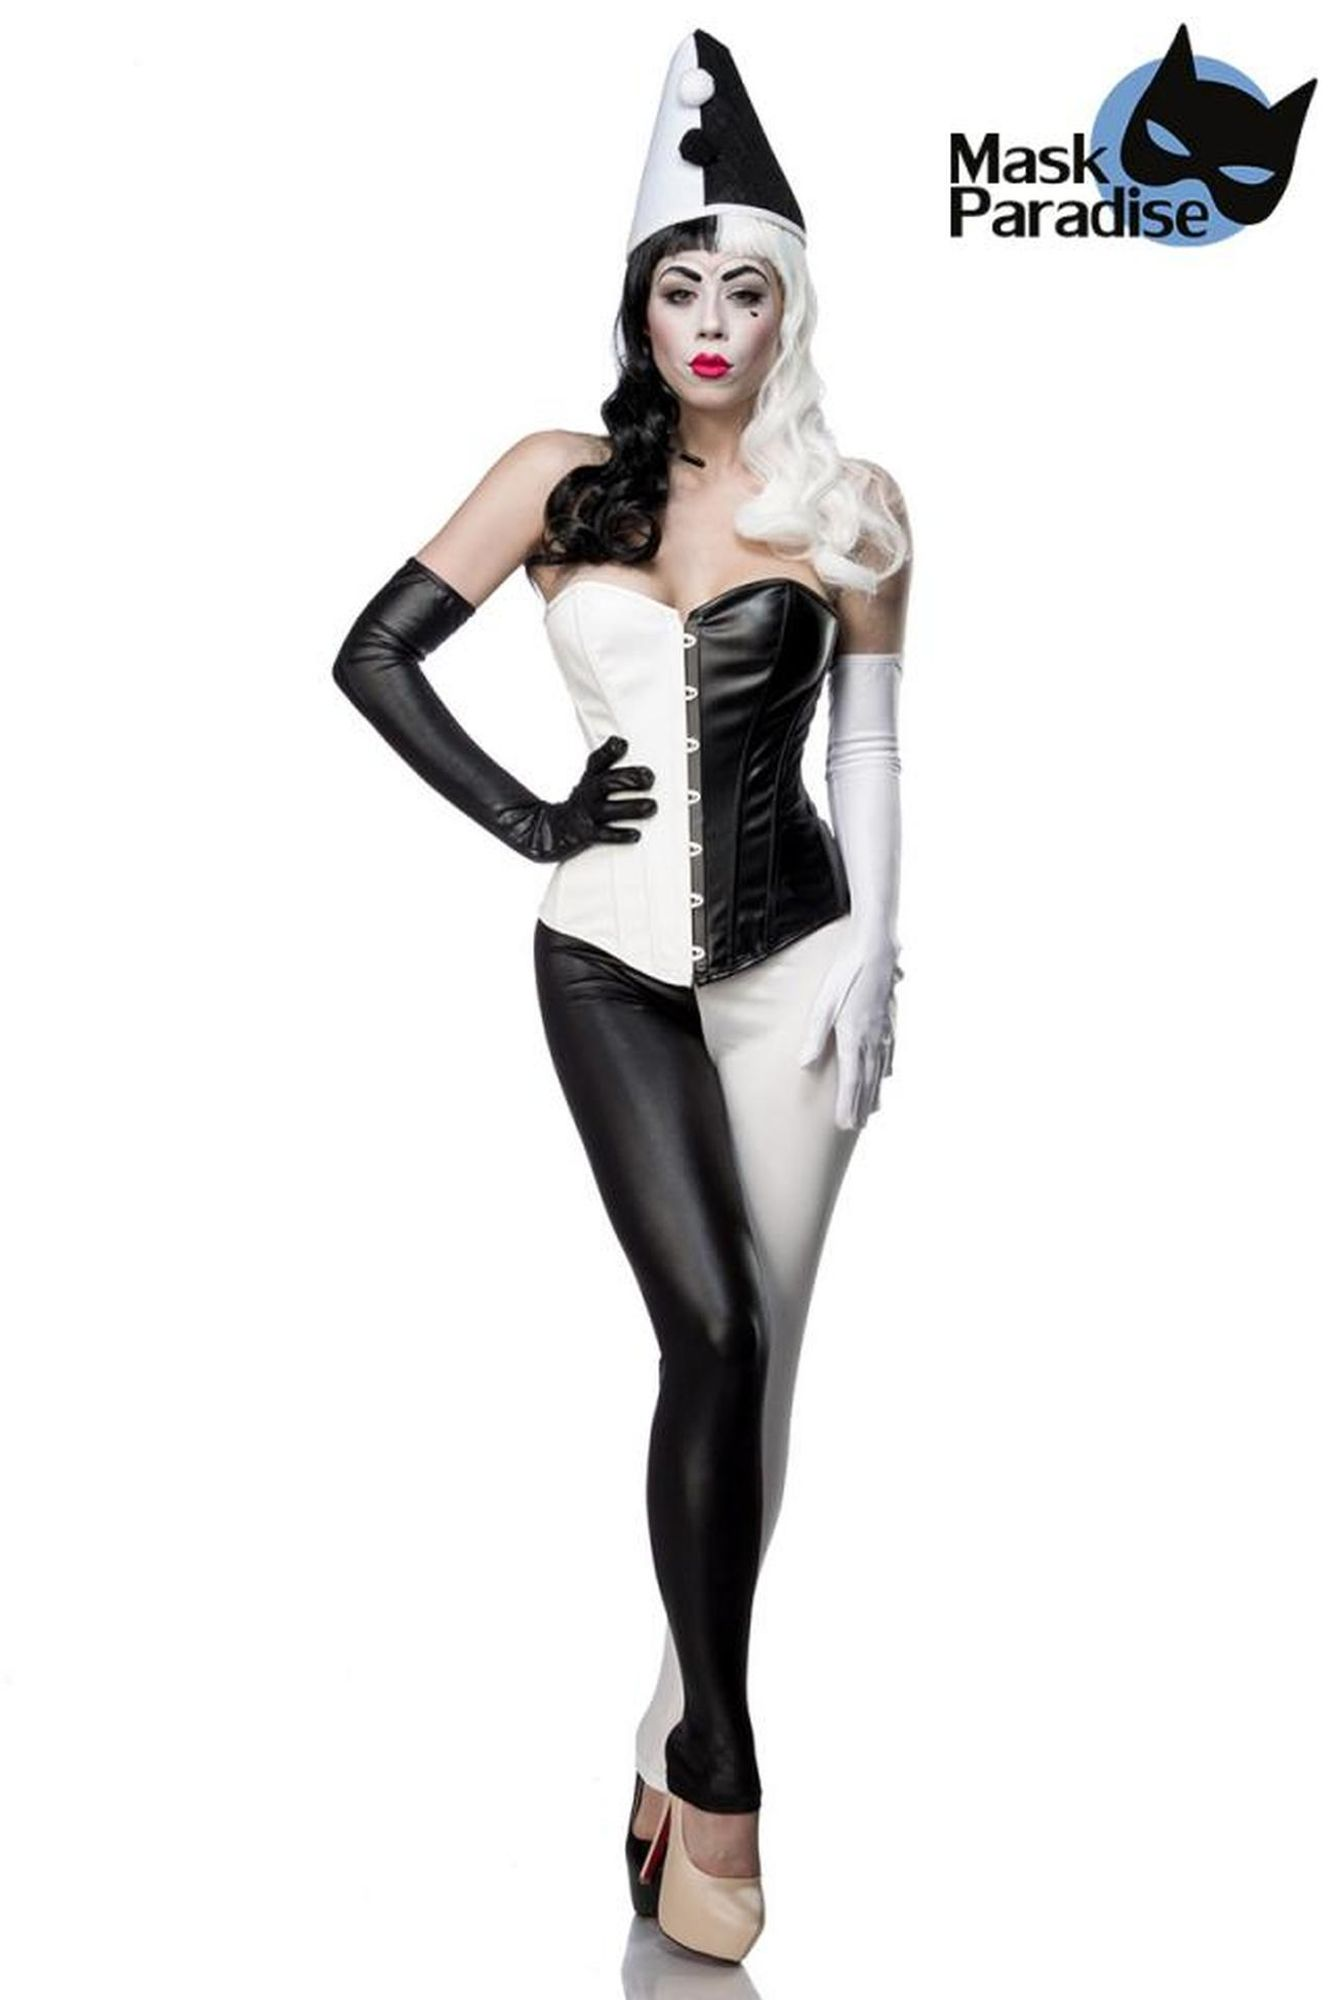 Mask Paradise Harlekinkostüm: Classic Harlequin - schwarz/weiß